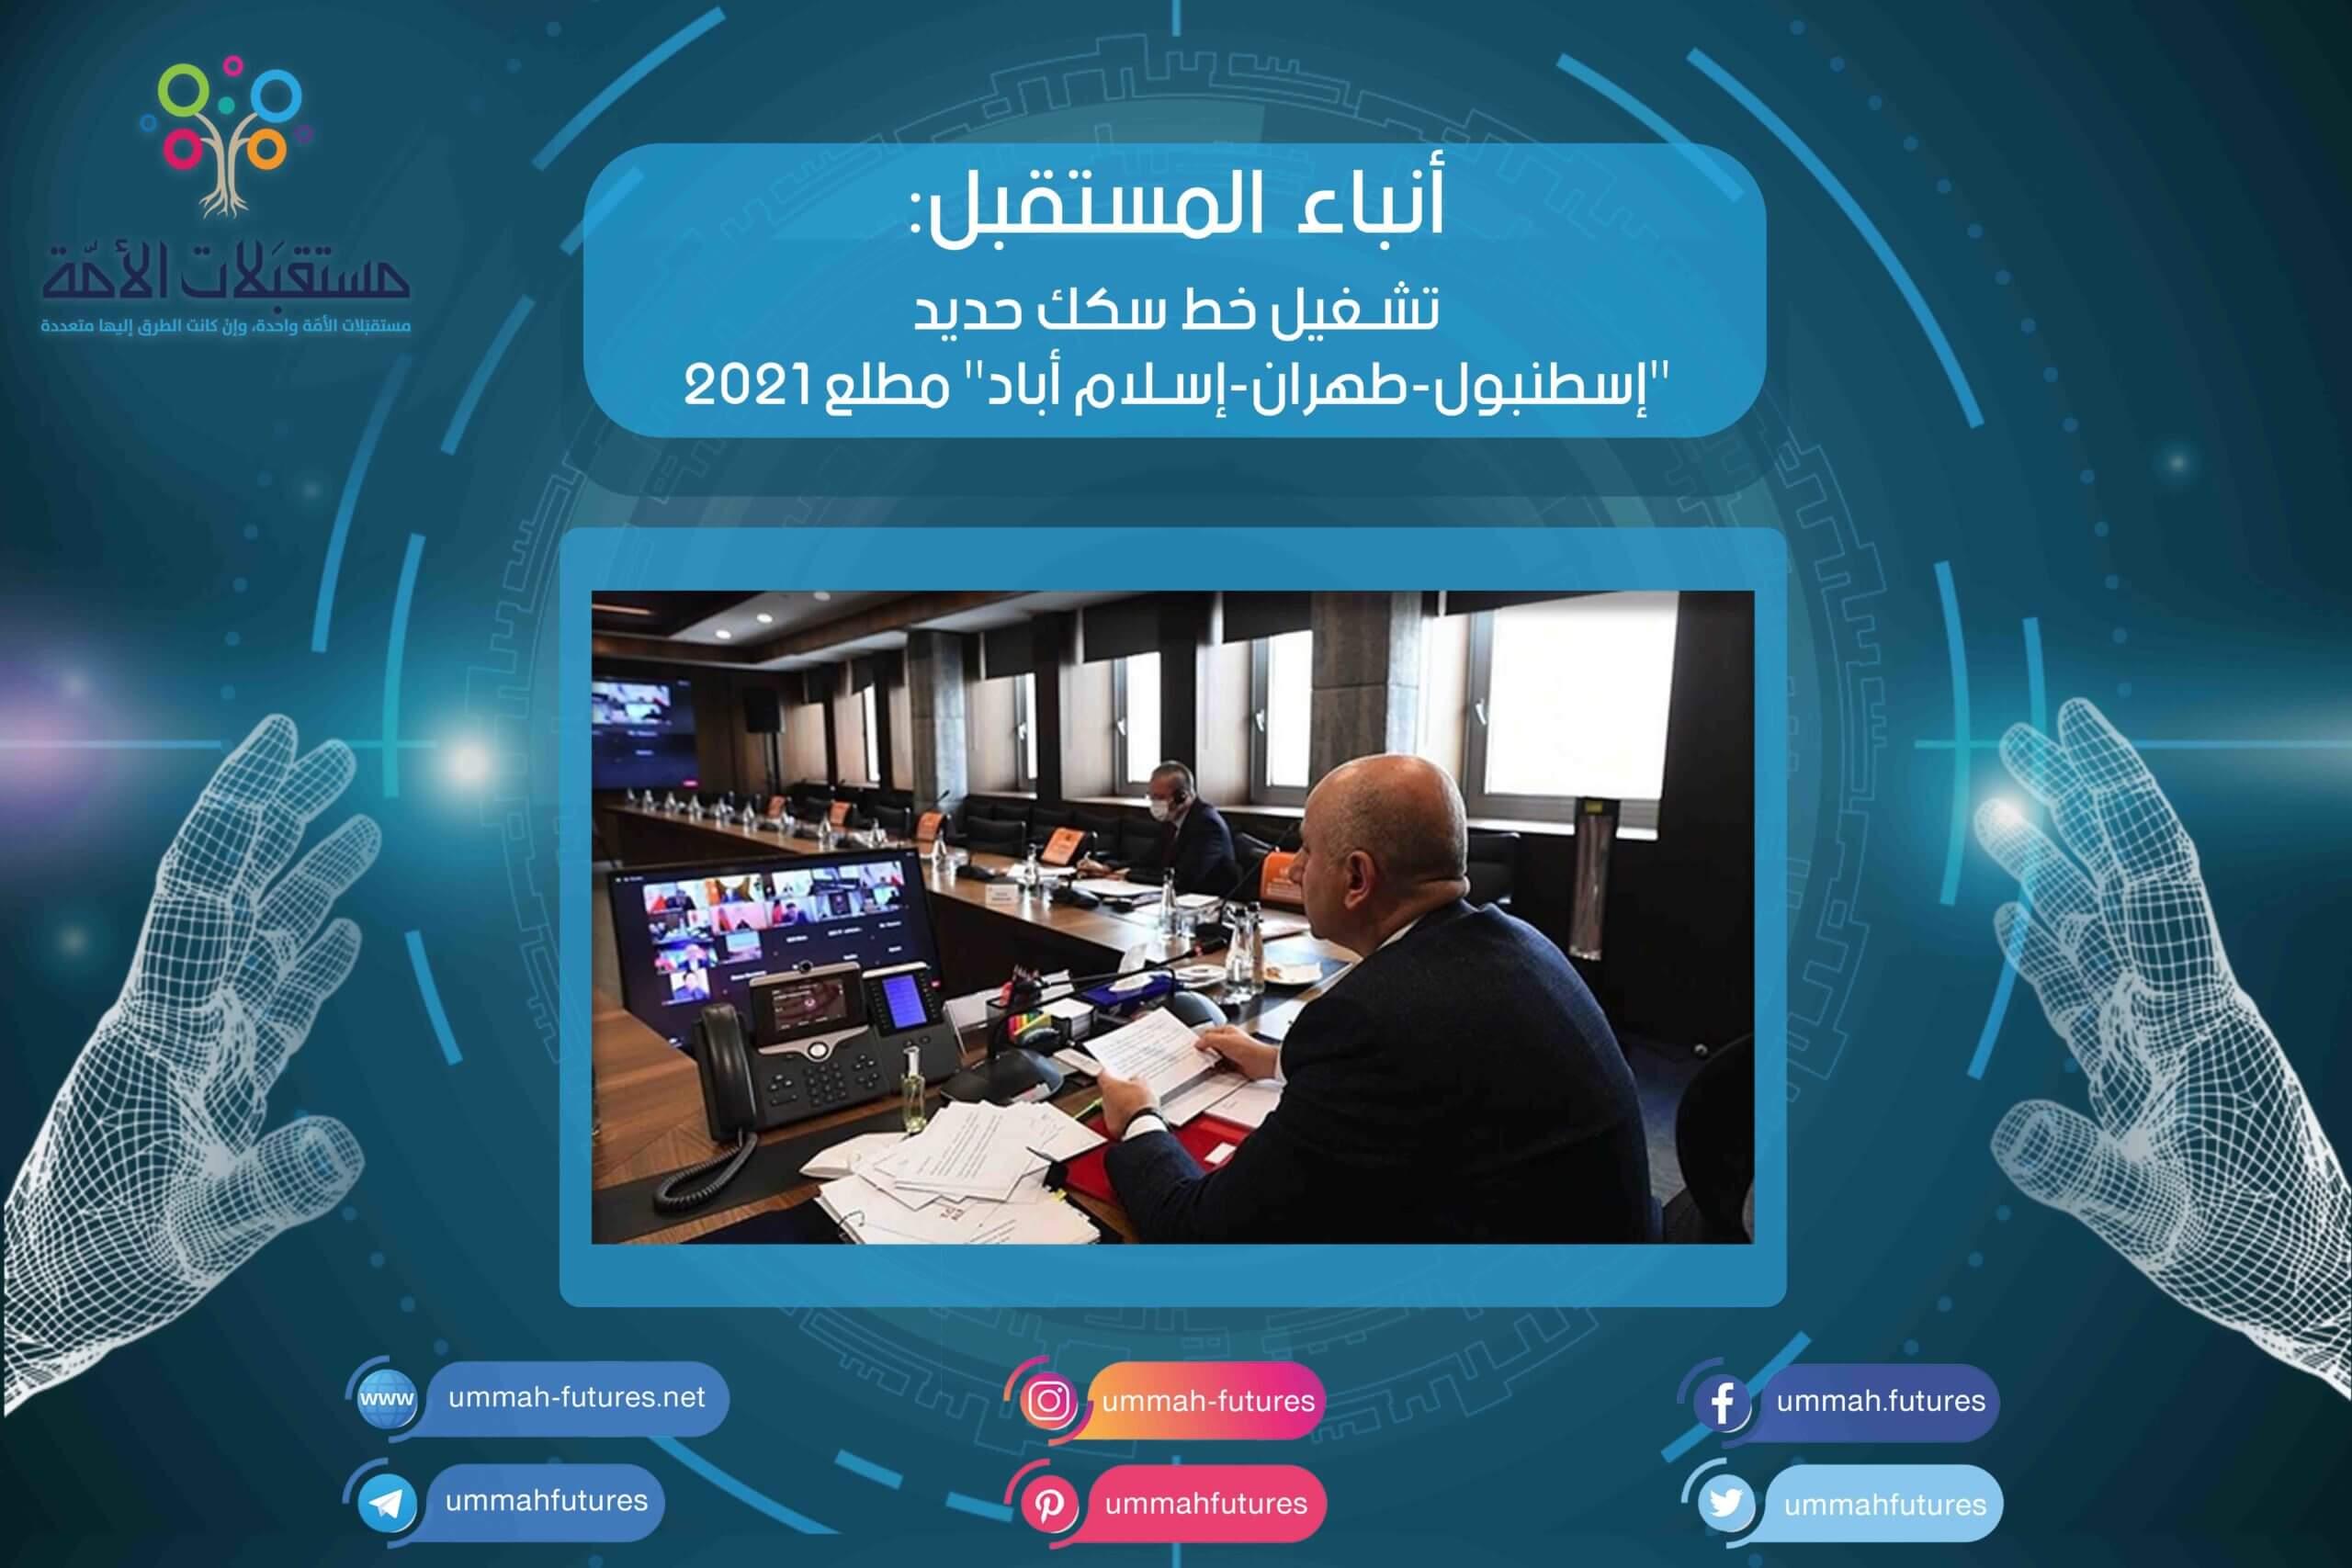 "تشغيل خط سكك حديد ""إسطنبول-طهران-إسلام أباد"" مطلع 2021"